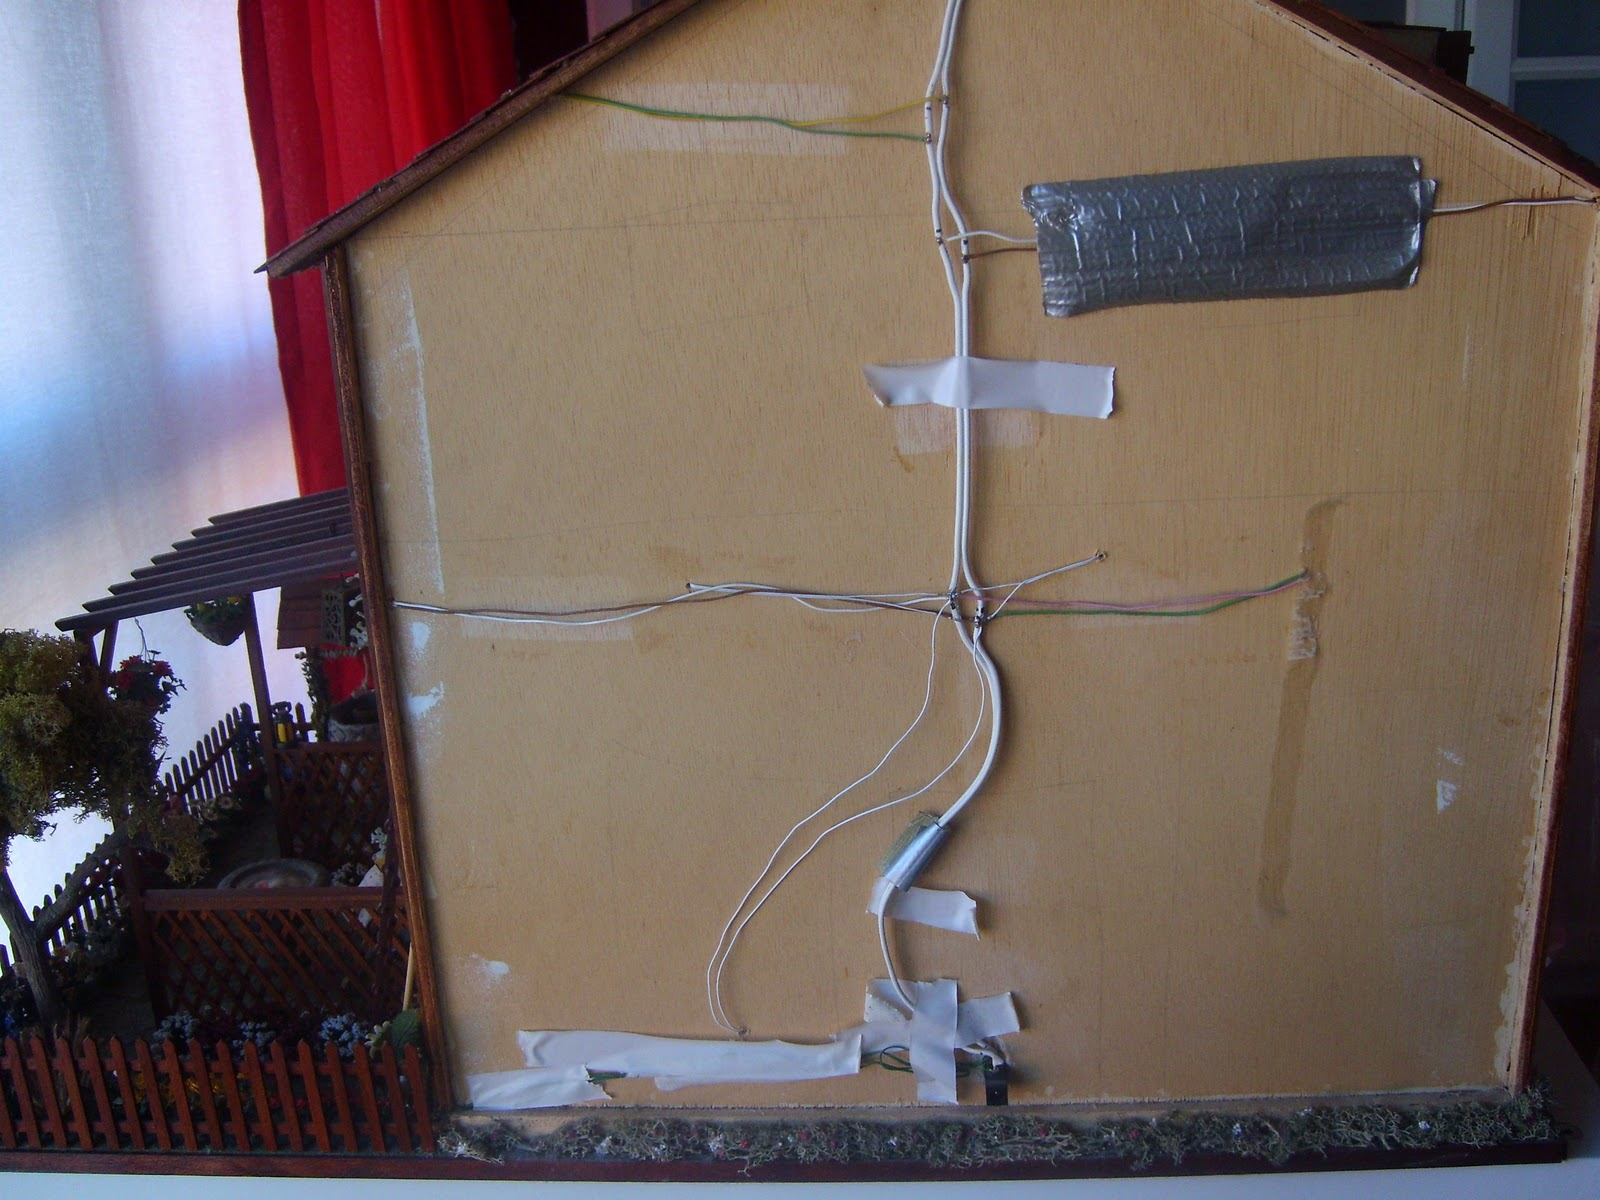 Minitink casa r stica vii - Instalacion electrica vista ...